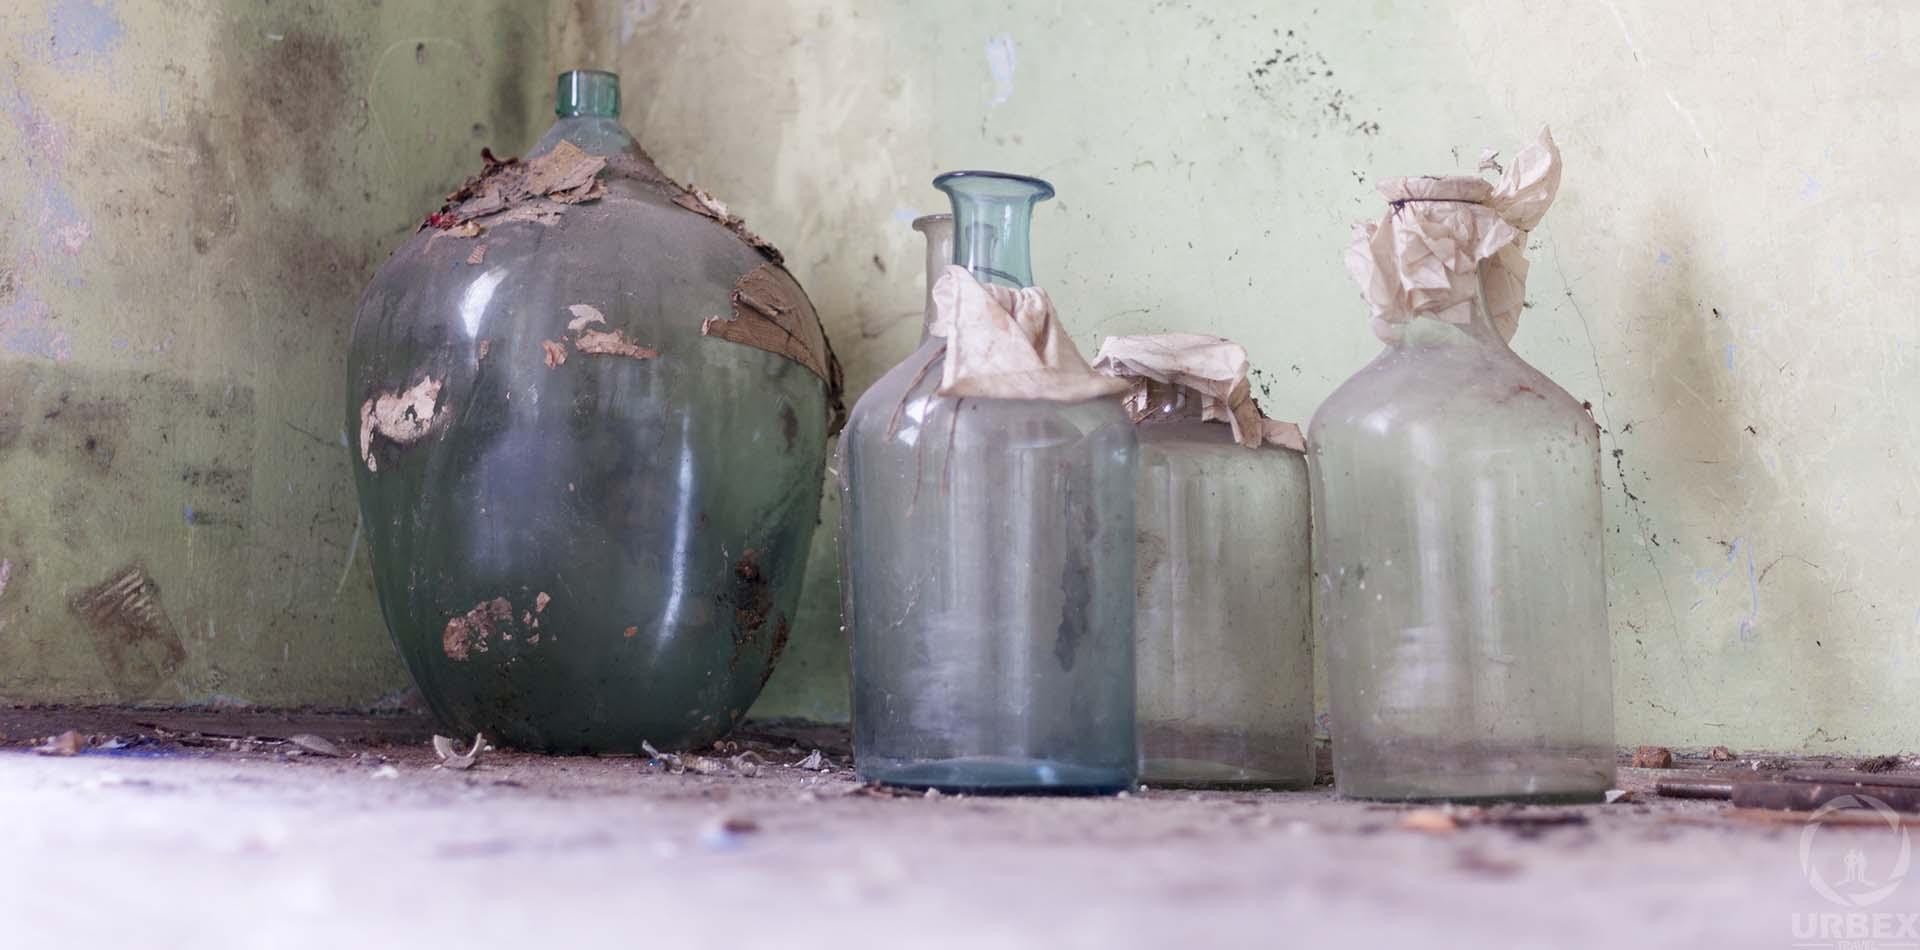 Bottle in Abandoned House